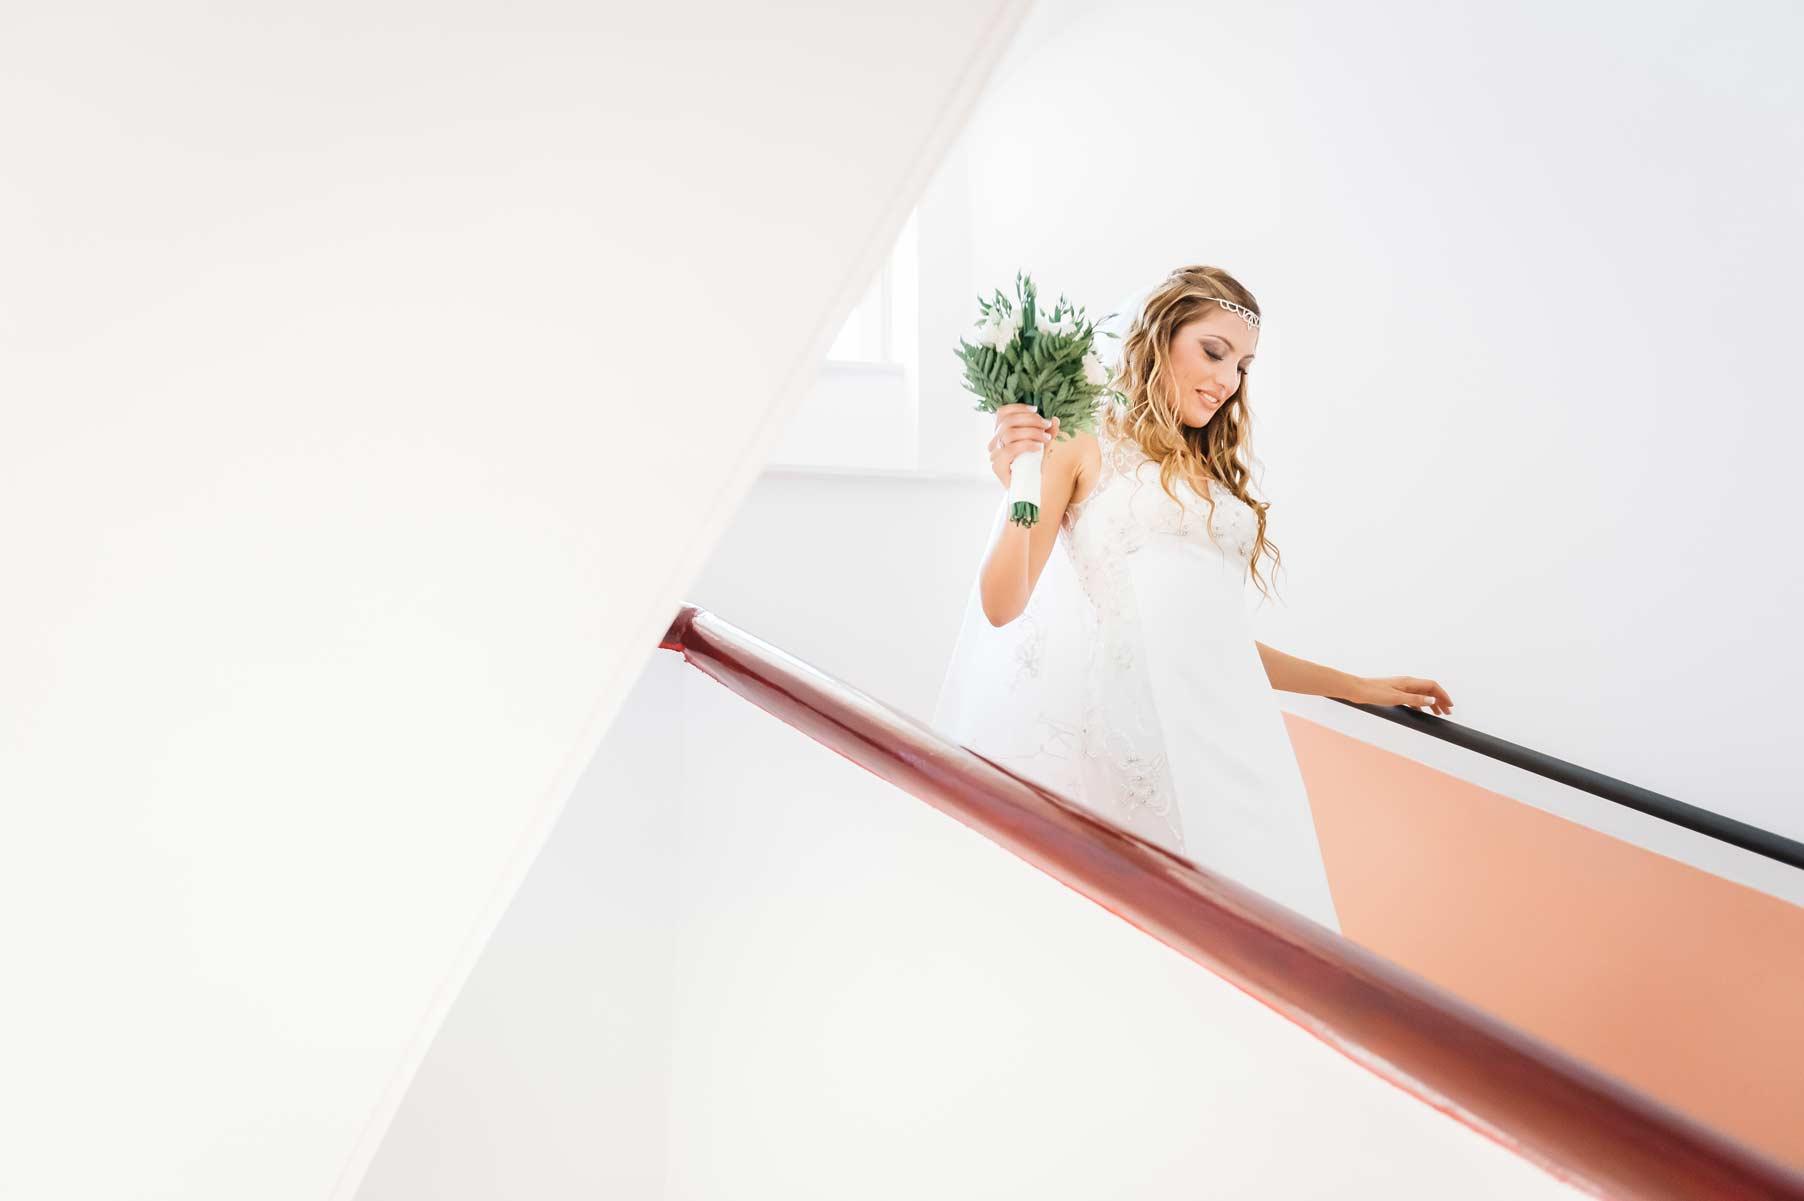 Reportage-Matrimonio-Fotografo-Roma-Preparativi-Sposa